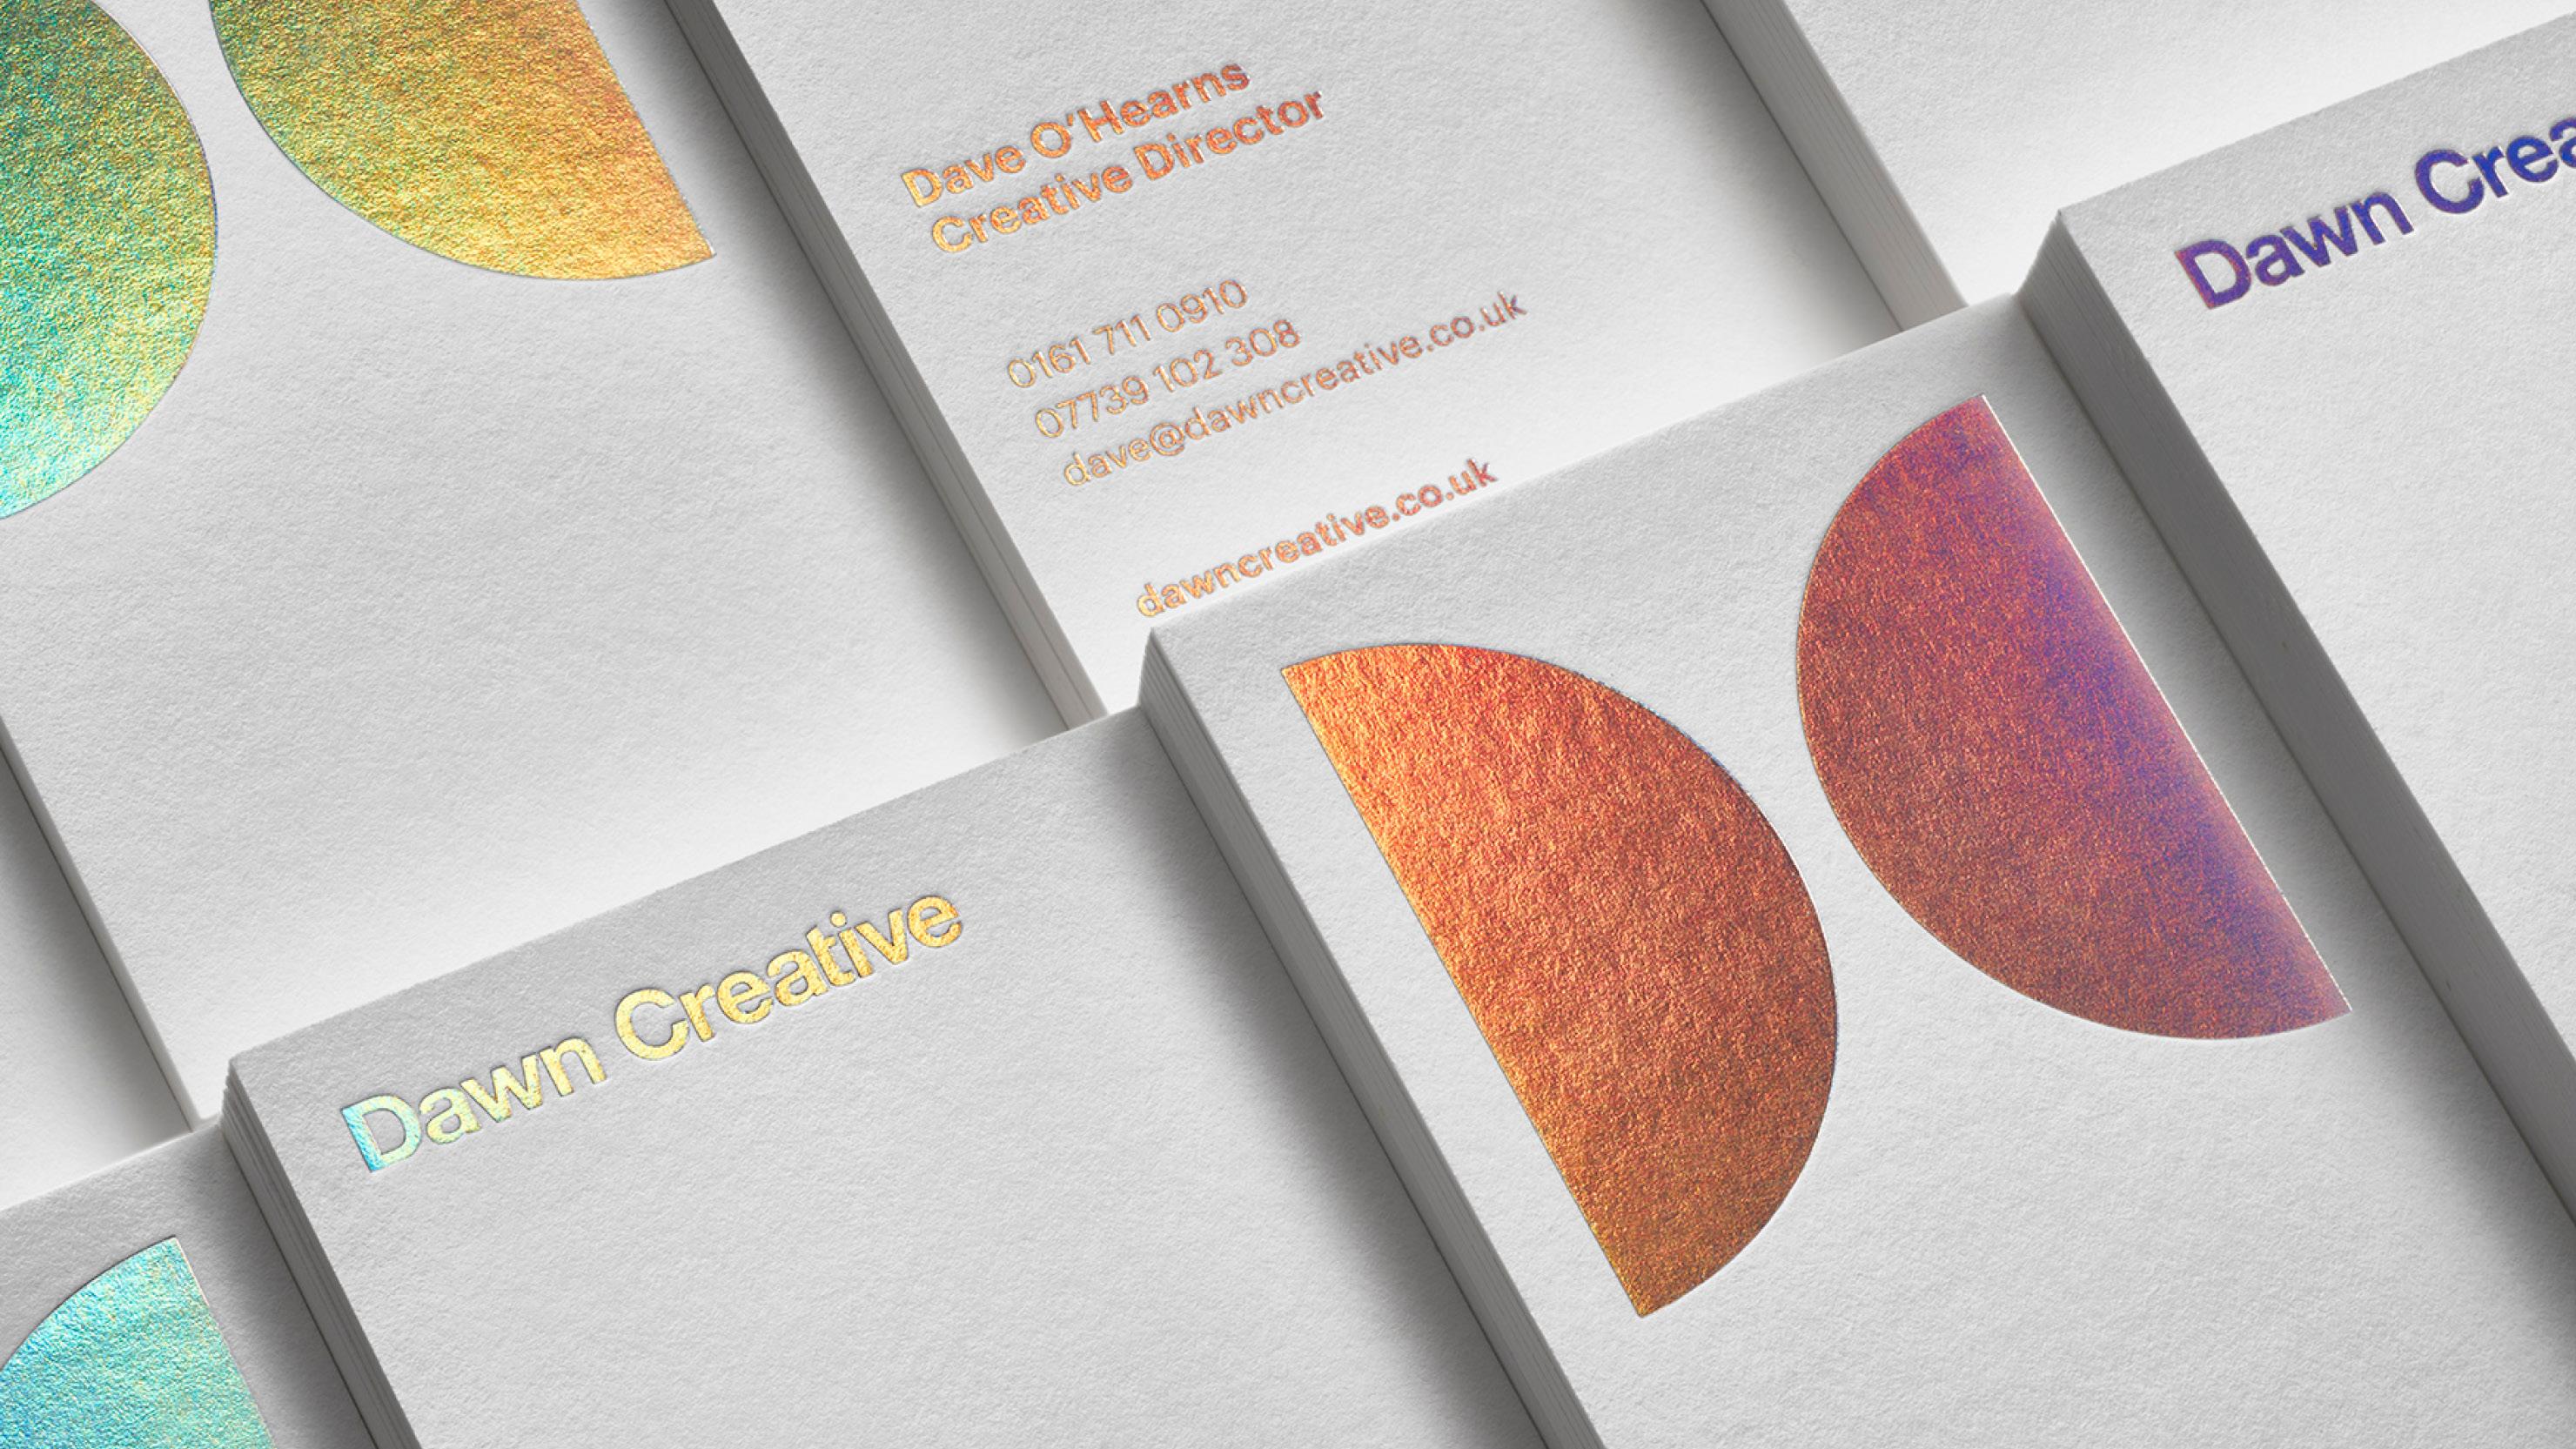 Dawn Creative Business Cards